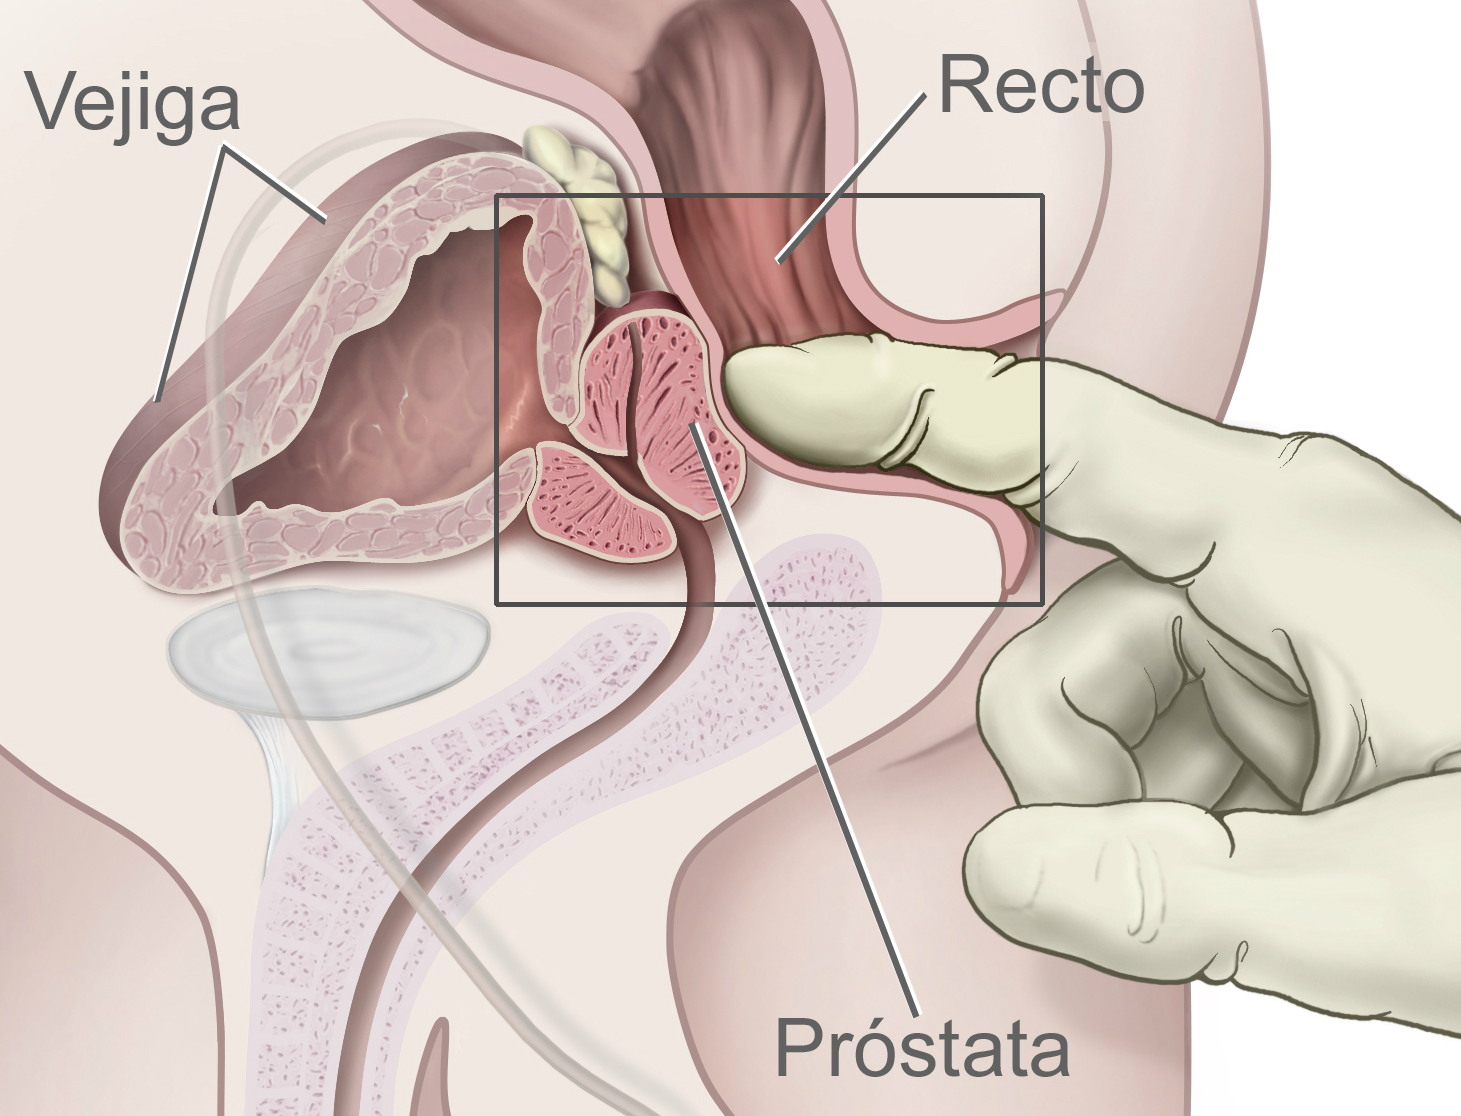 Indicadores de próstata en análisis de sangre